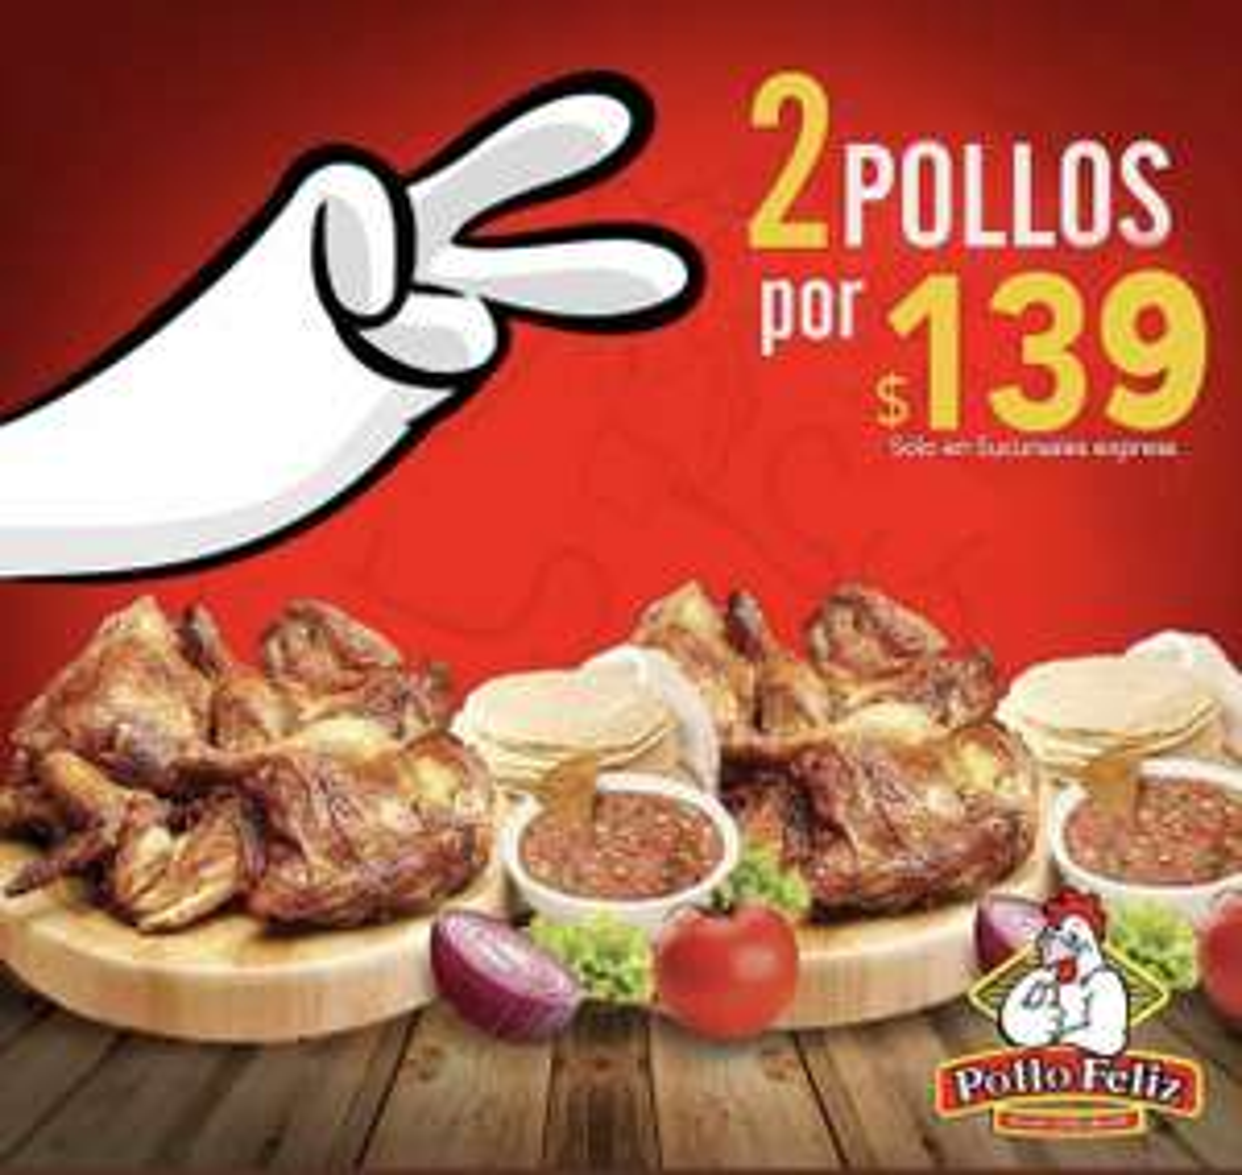 Pollo feliz : 2 pollos x 139 pesos